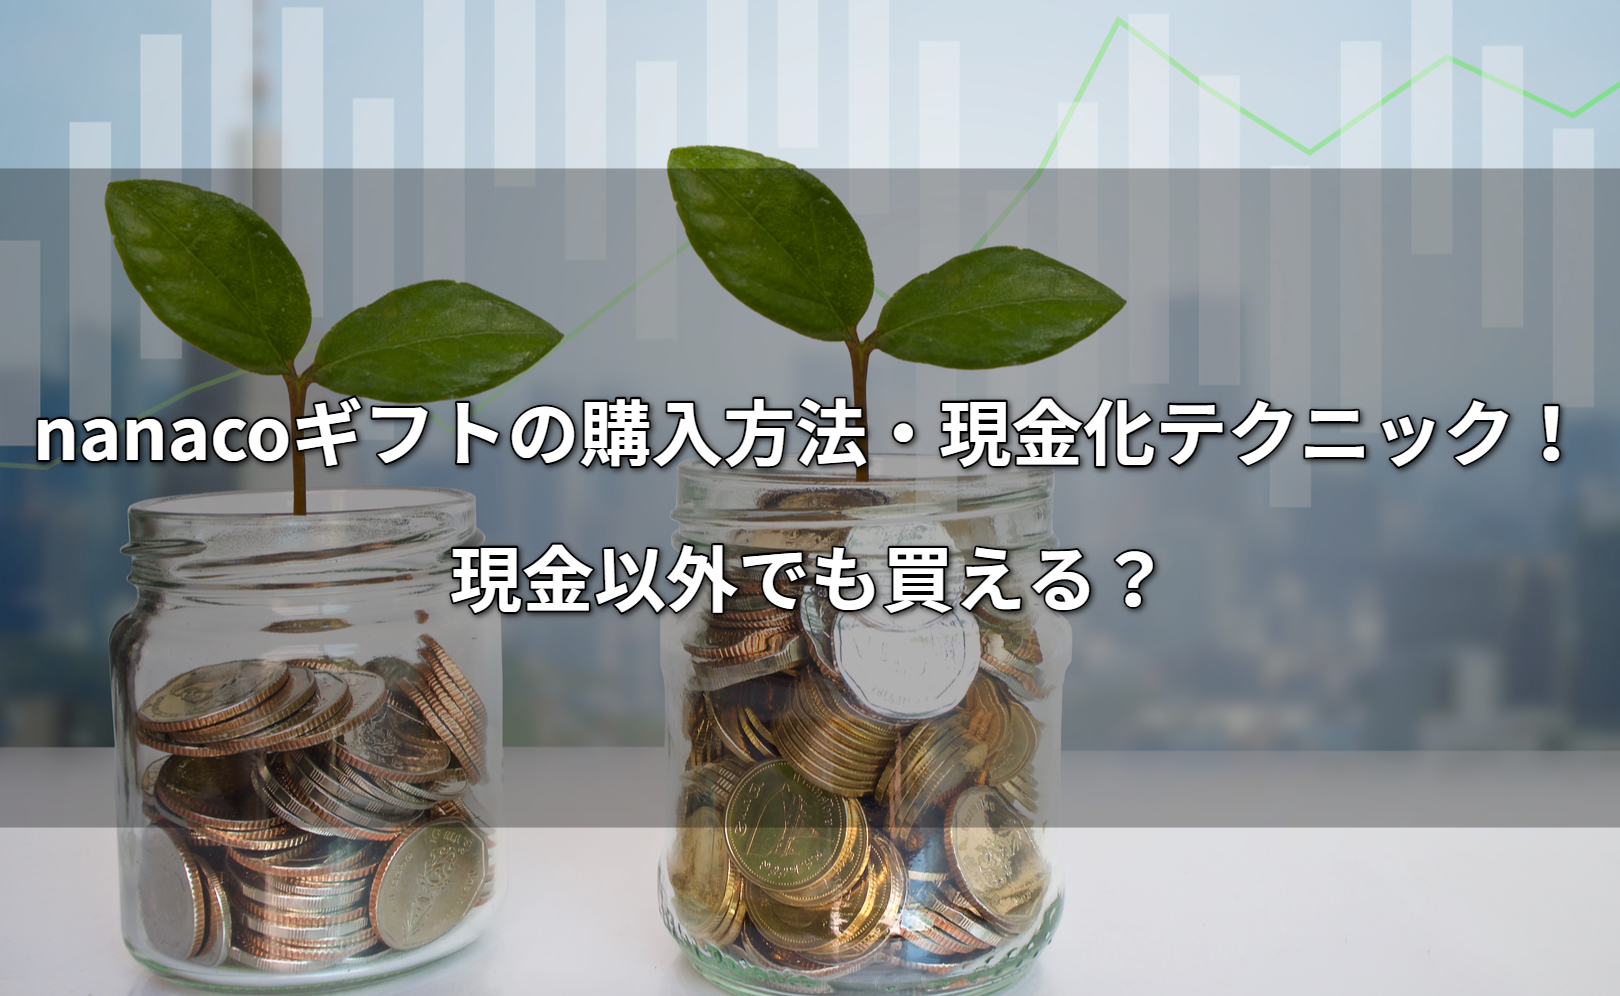 nanacoギフトの購入方法・現金化テクニック!現金以外でも買える?